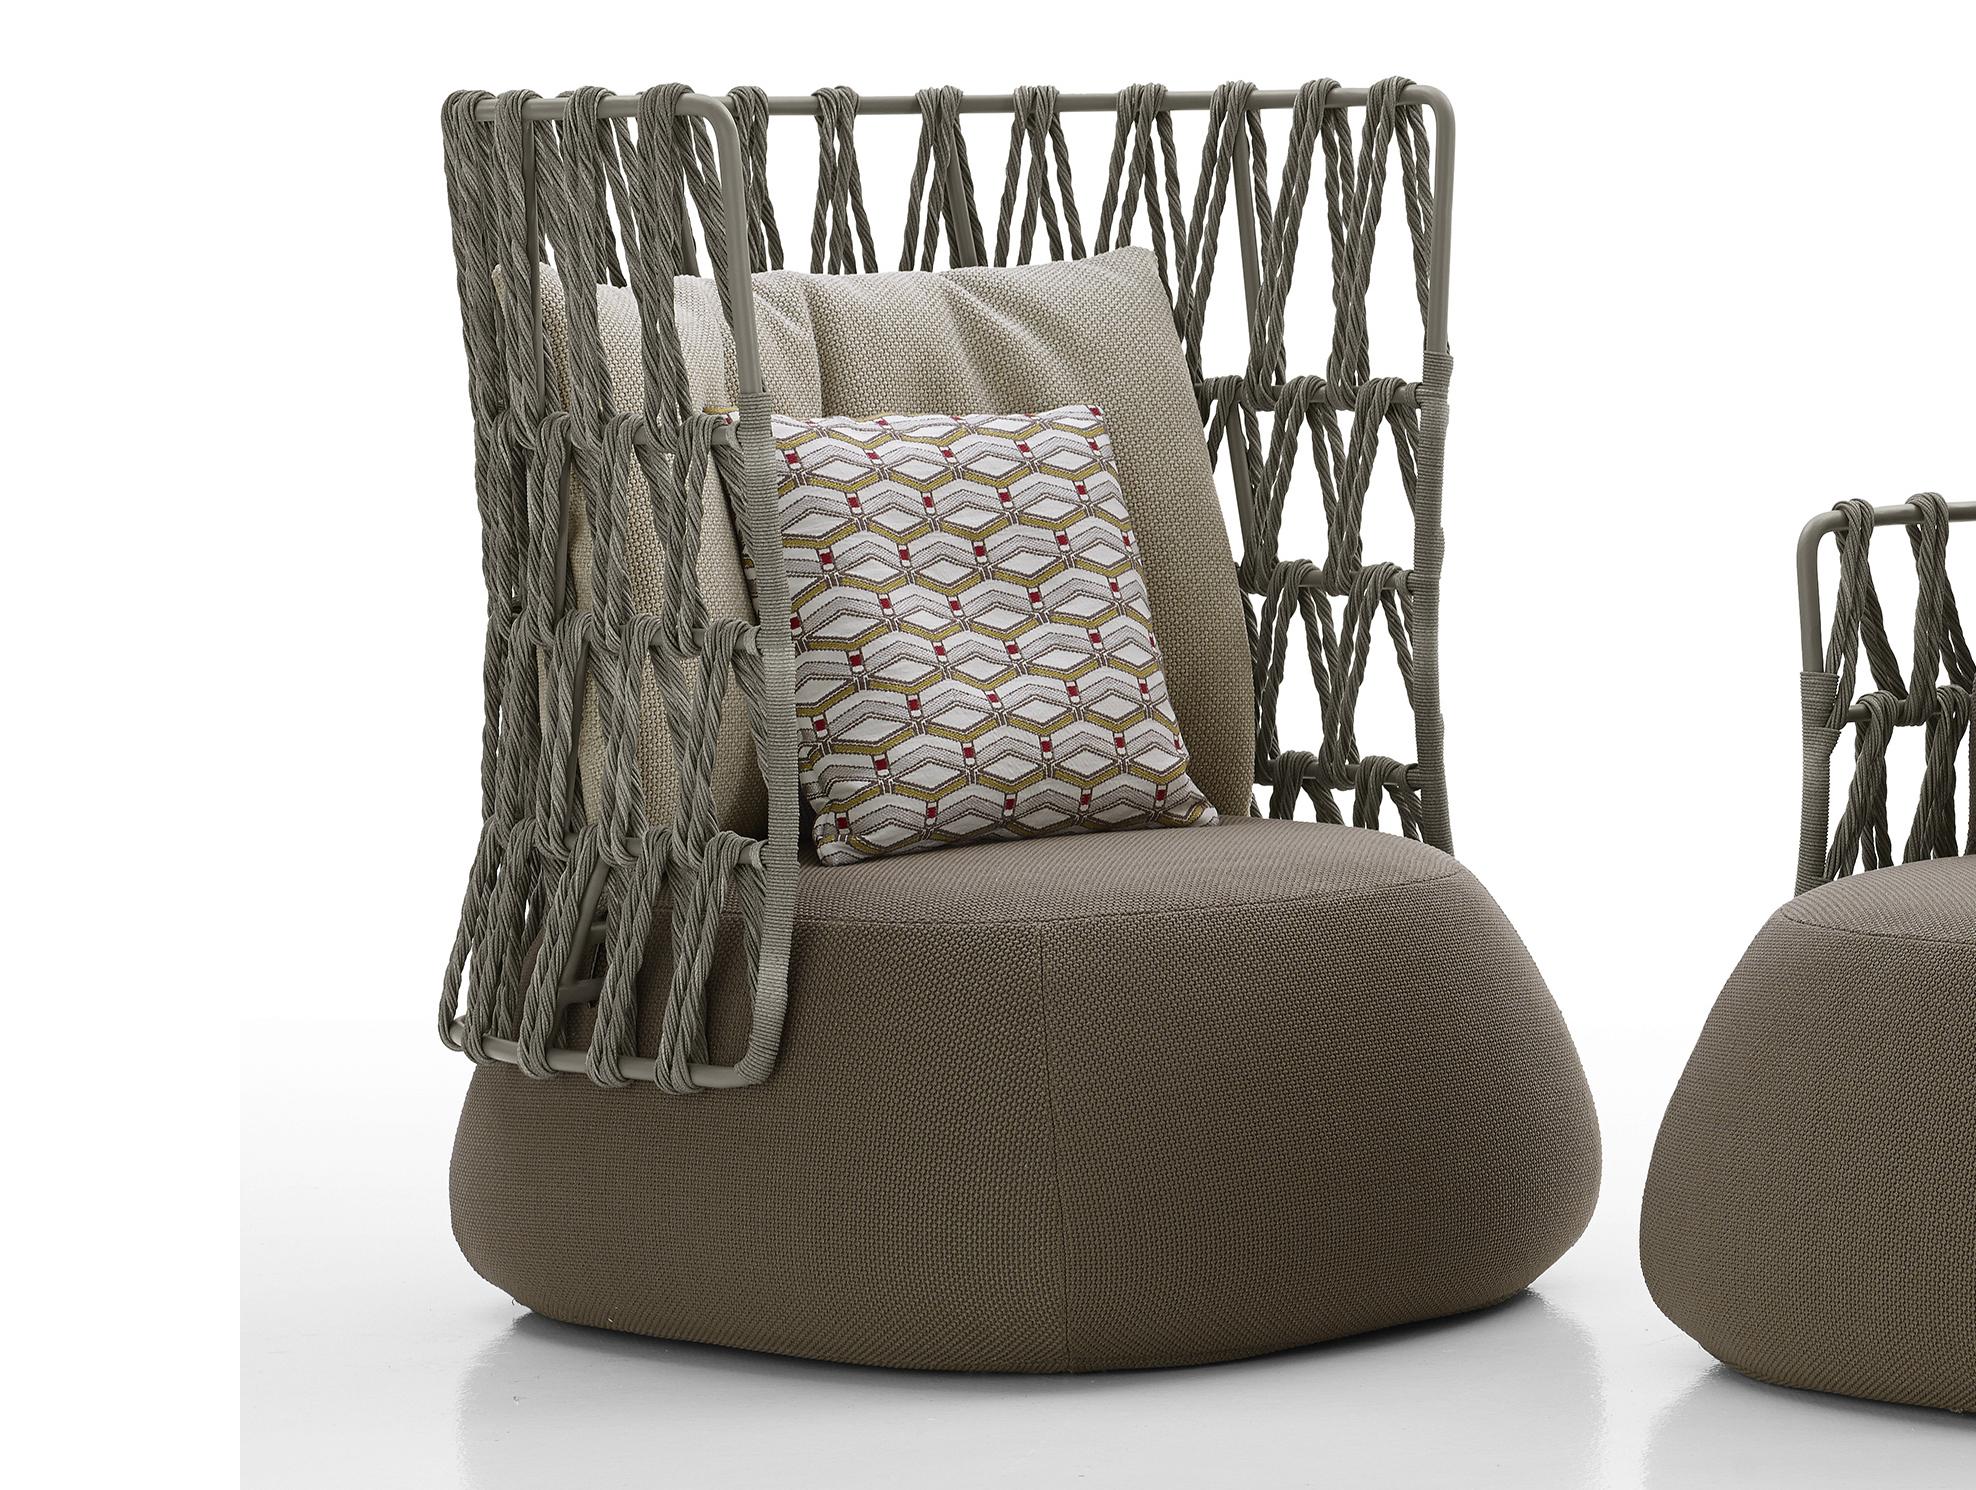 assis dehors le temps. Black Bedroom Furniture Sets. Home Design Ideas